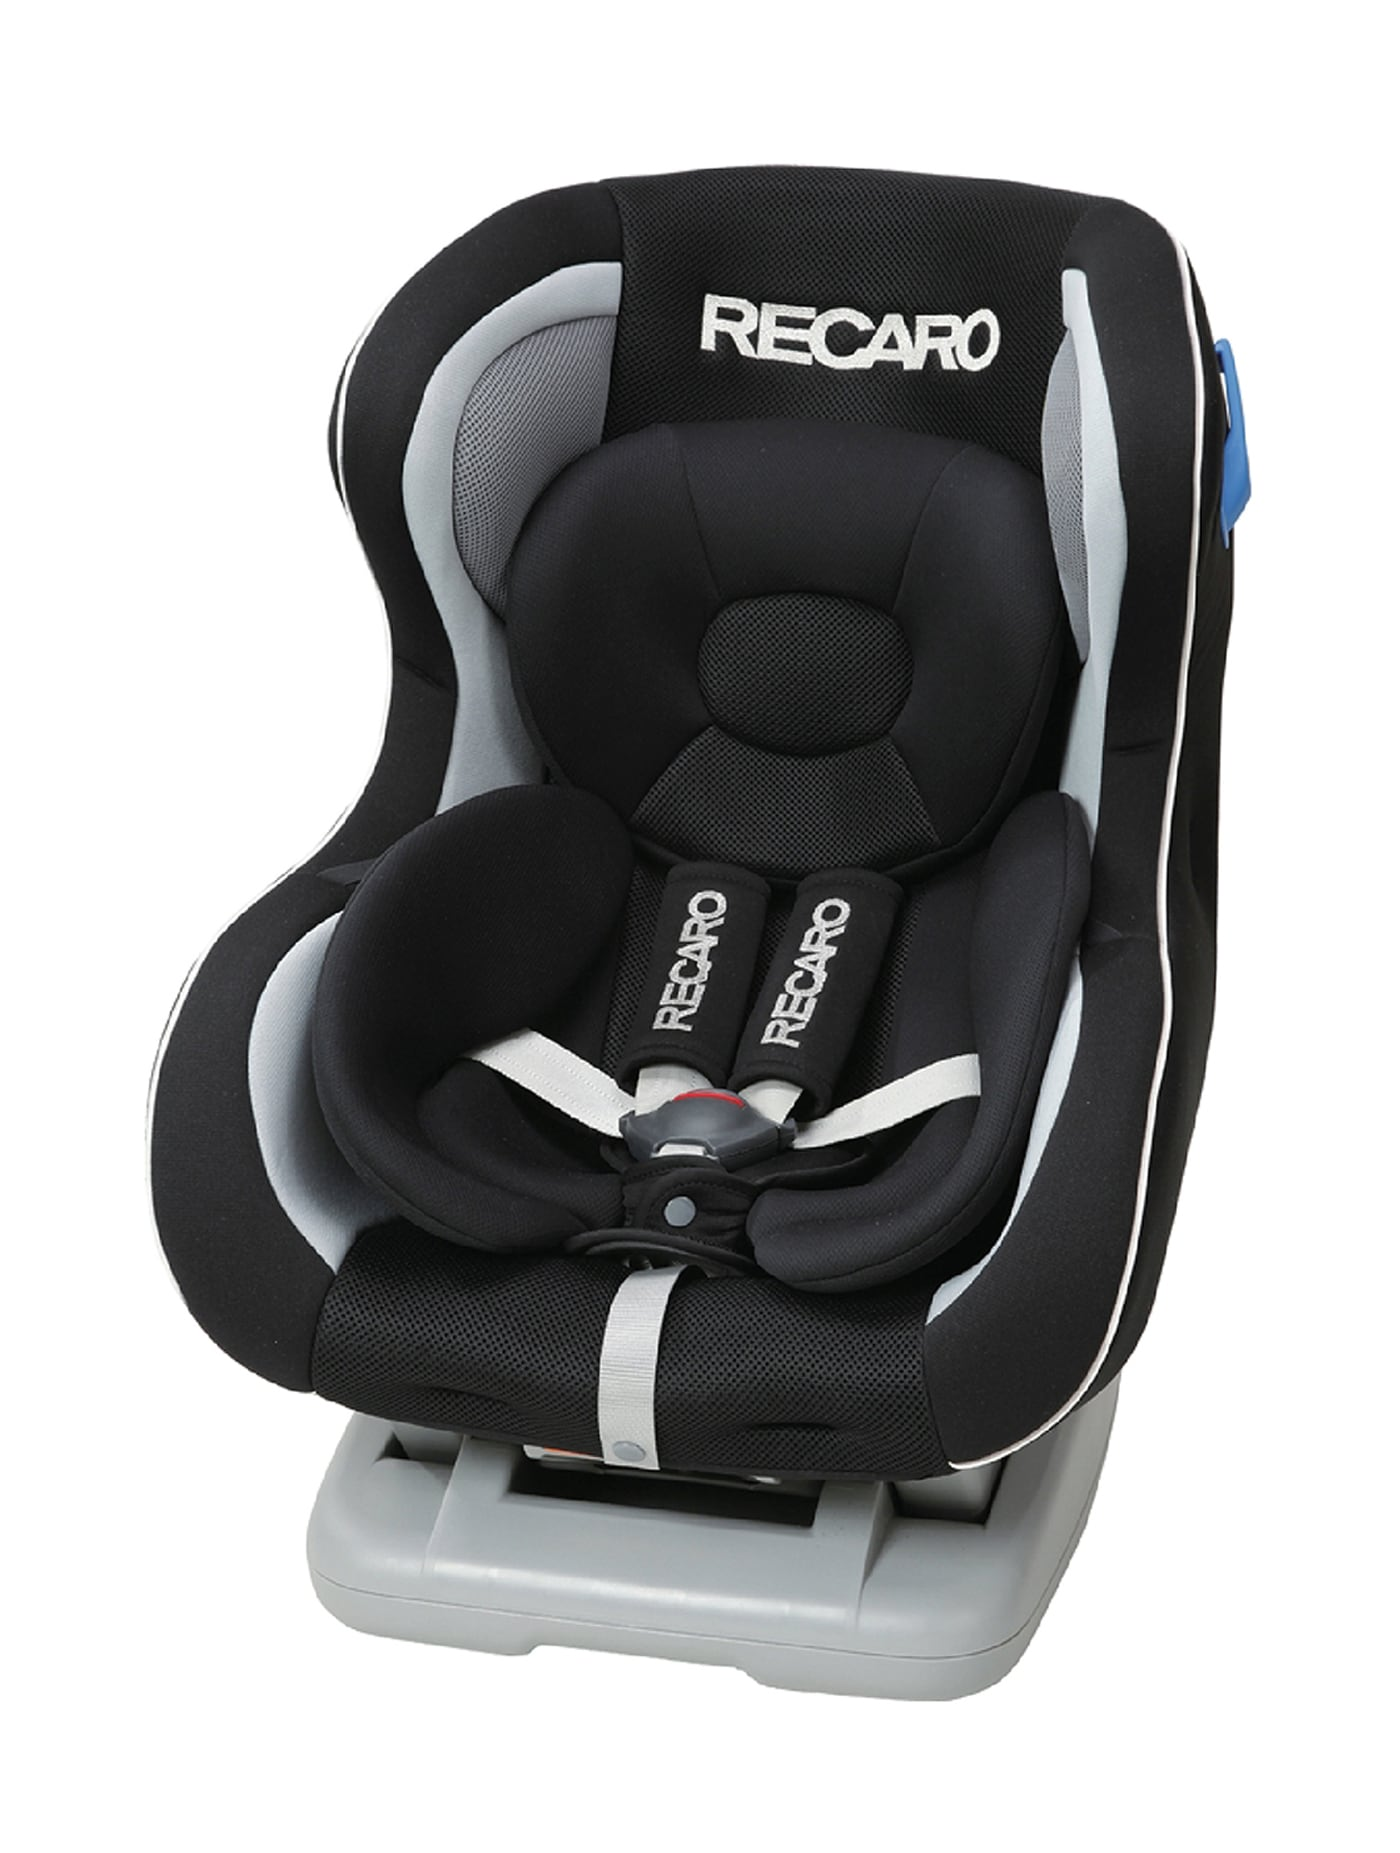 Infant Car Seat Recaro Infant Car Seat Weight Limit